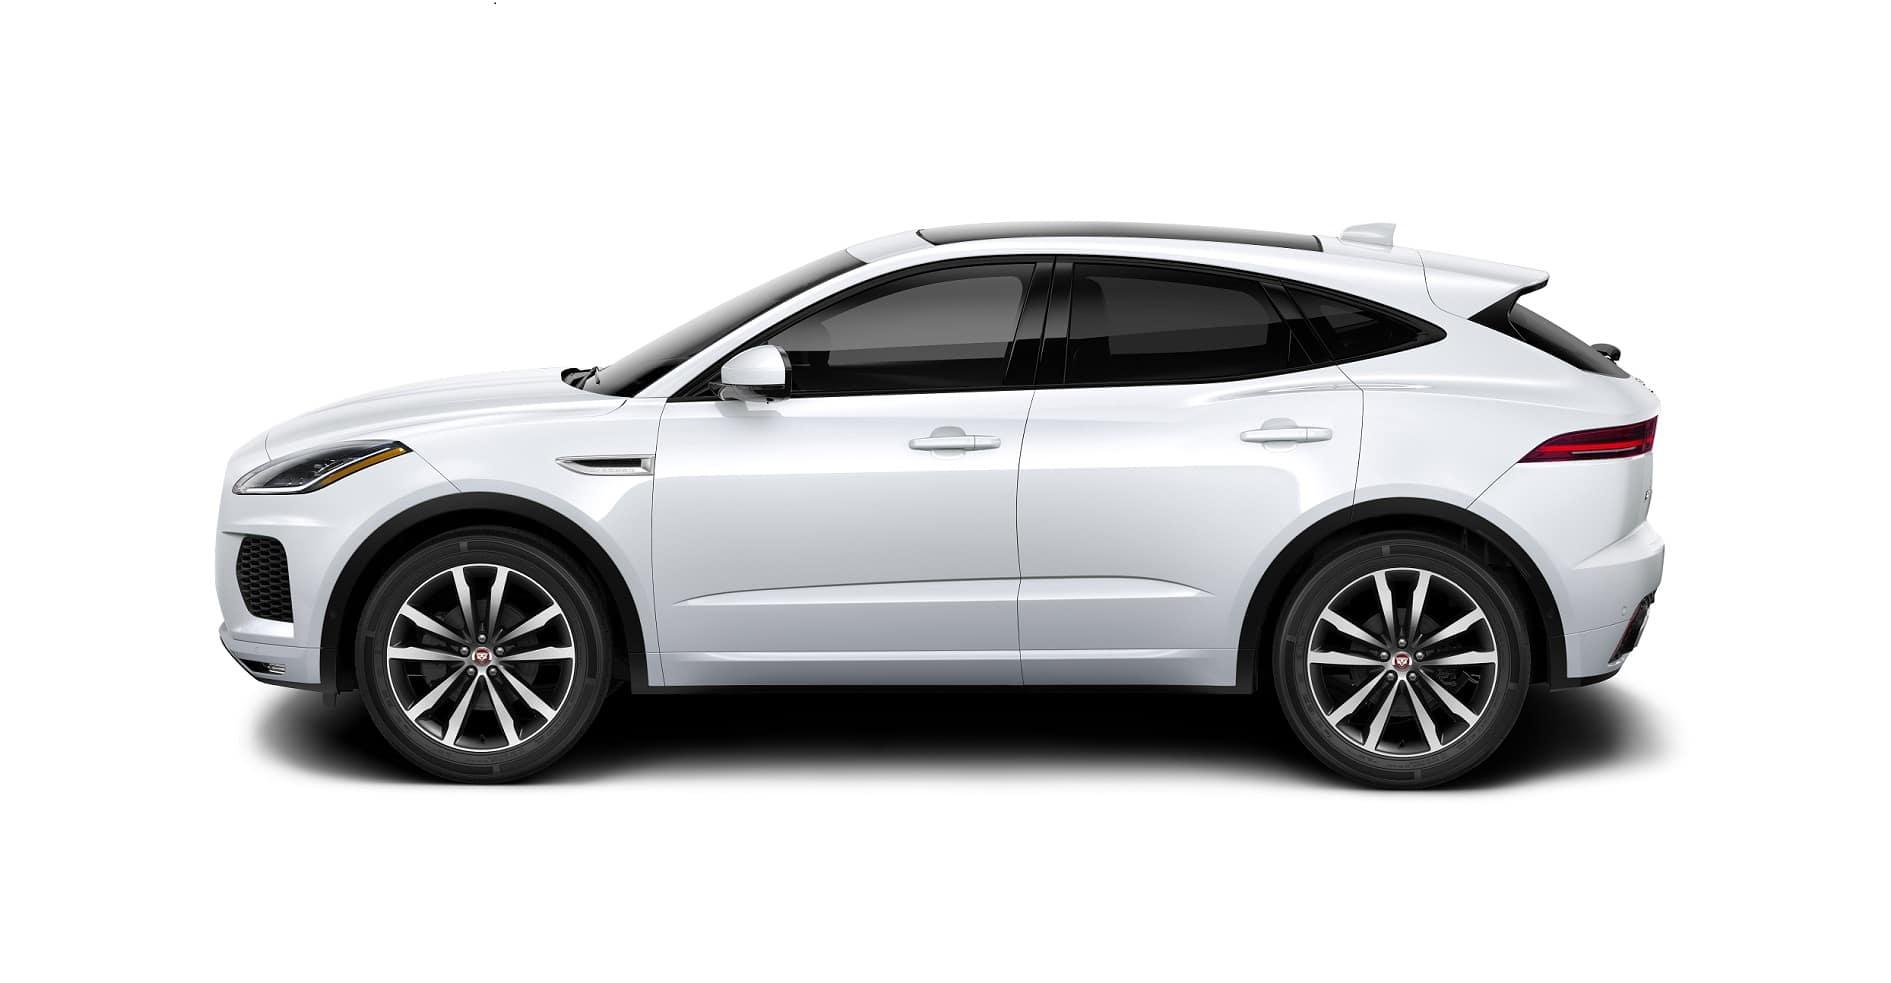 2018 Jaguar E-Pace Crossover SUV